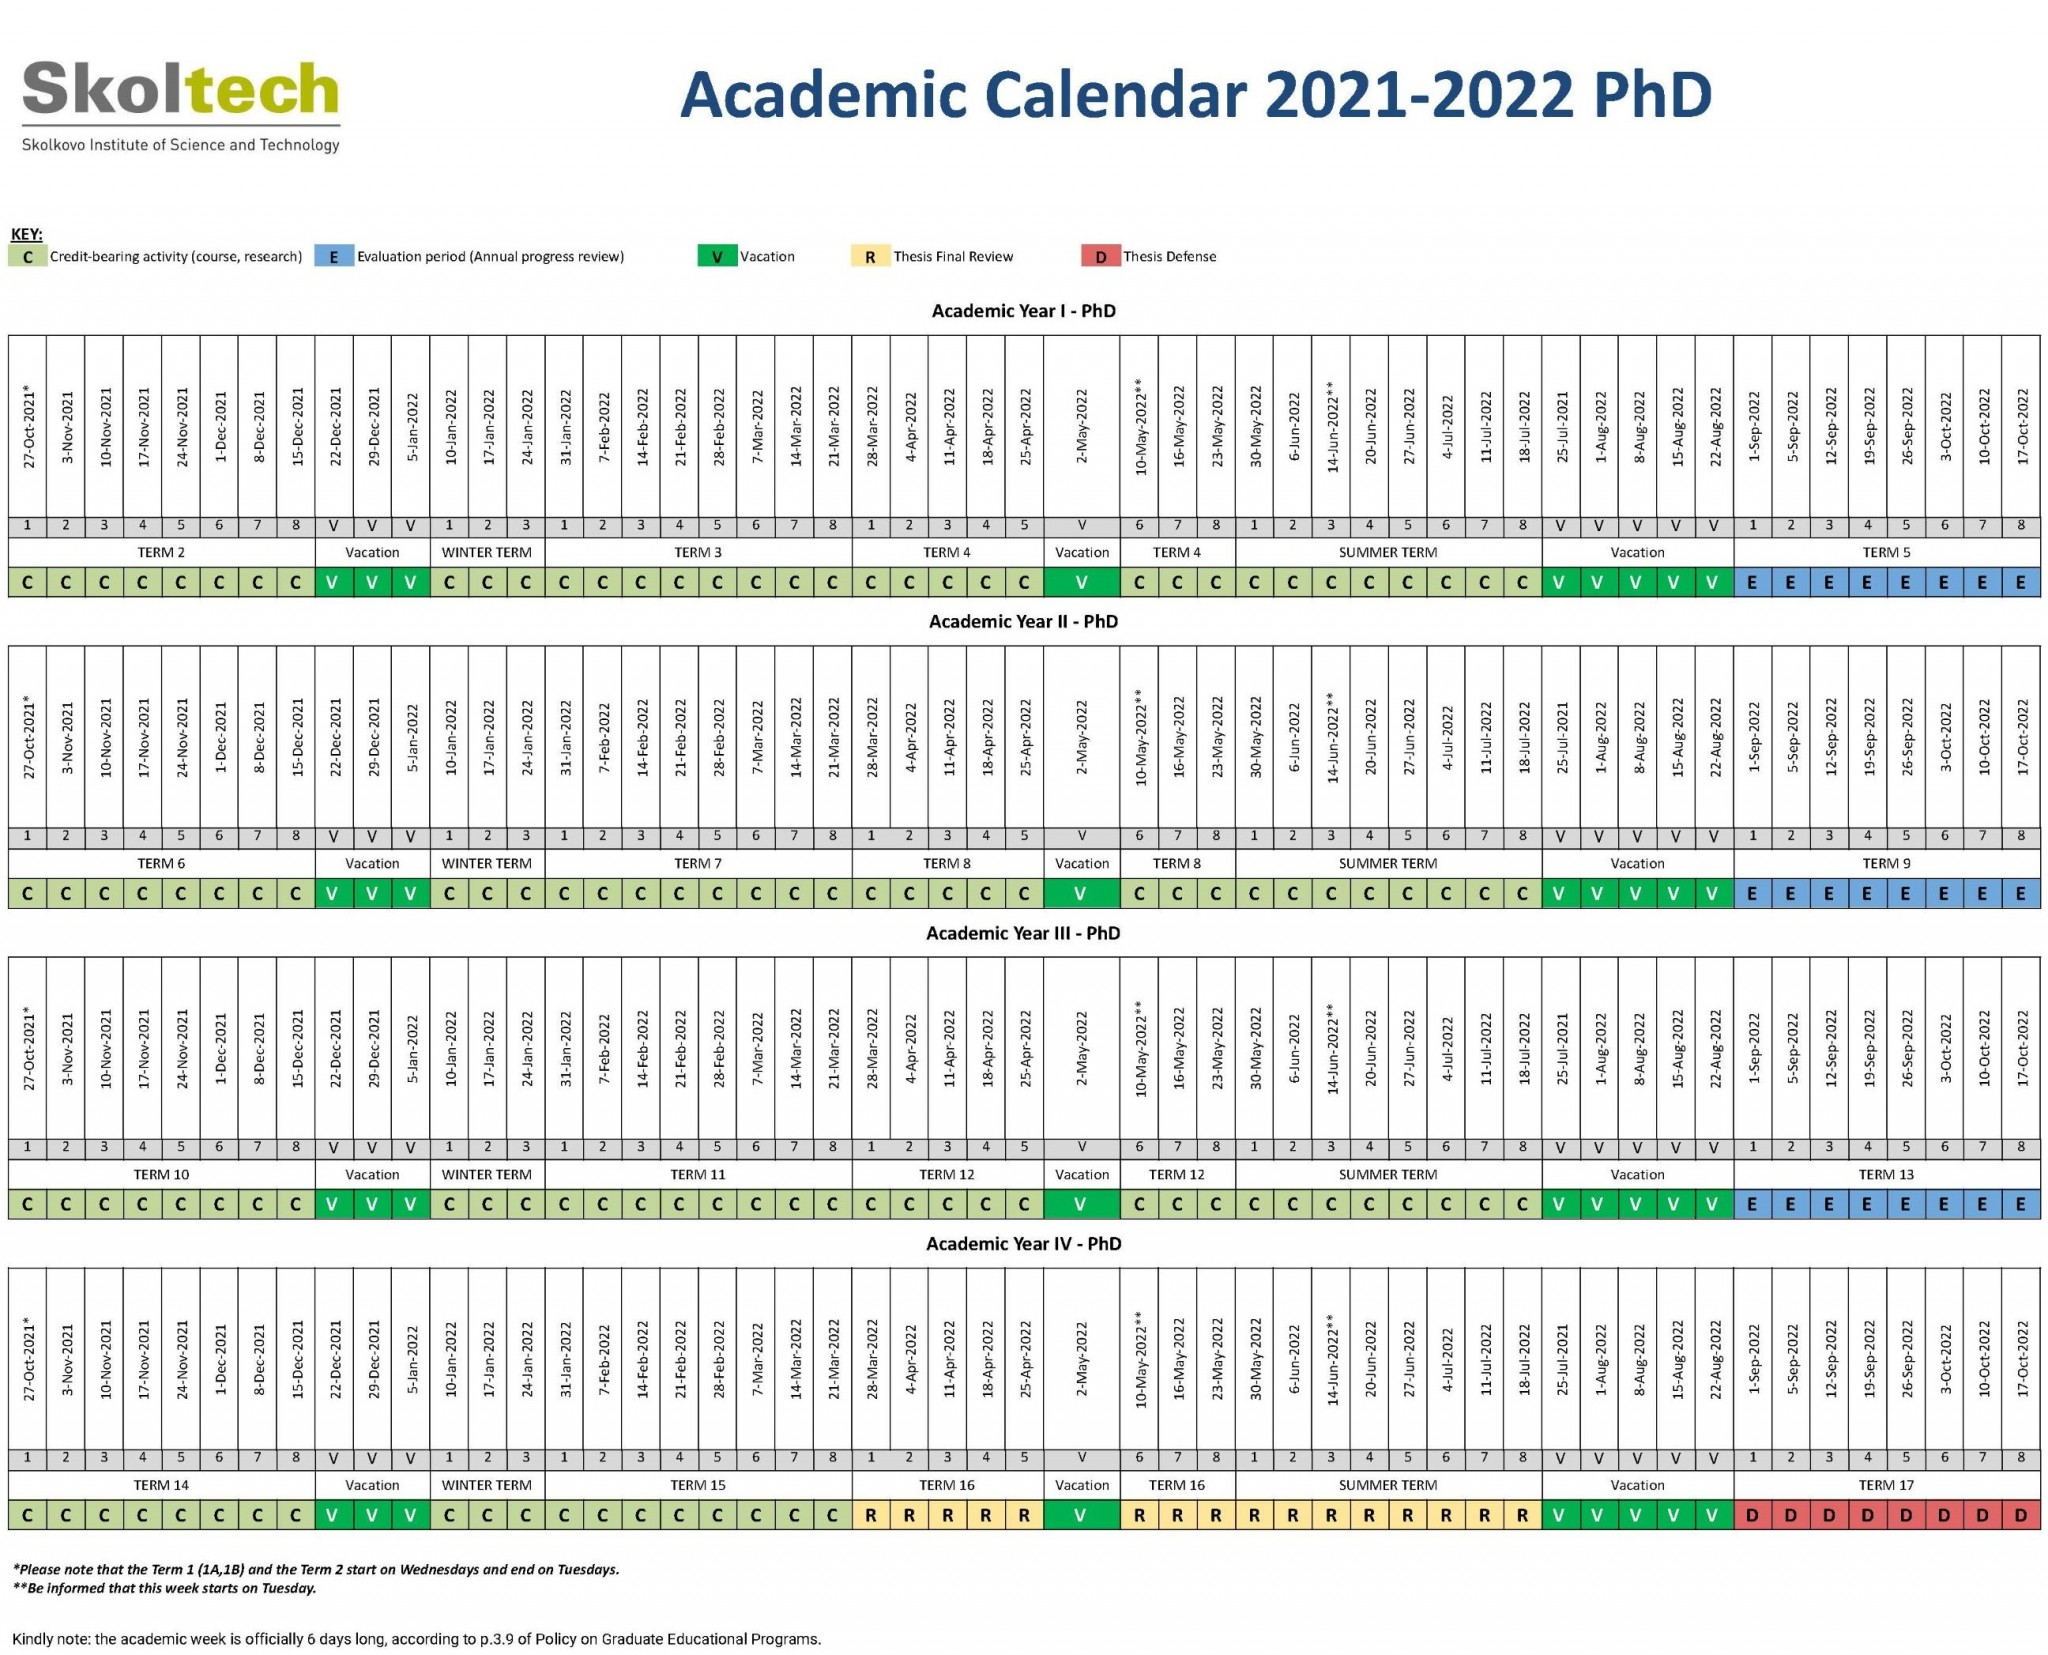 phd-academic_year_calendar_-2021-2022_-ay_phd_basic-1